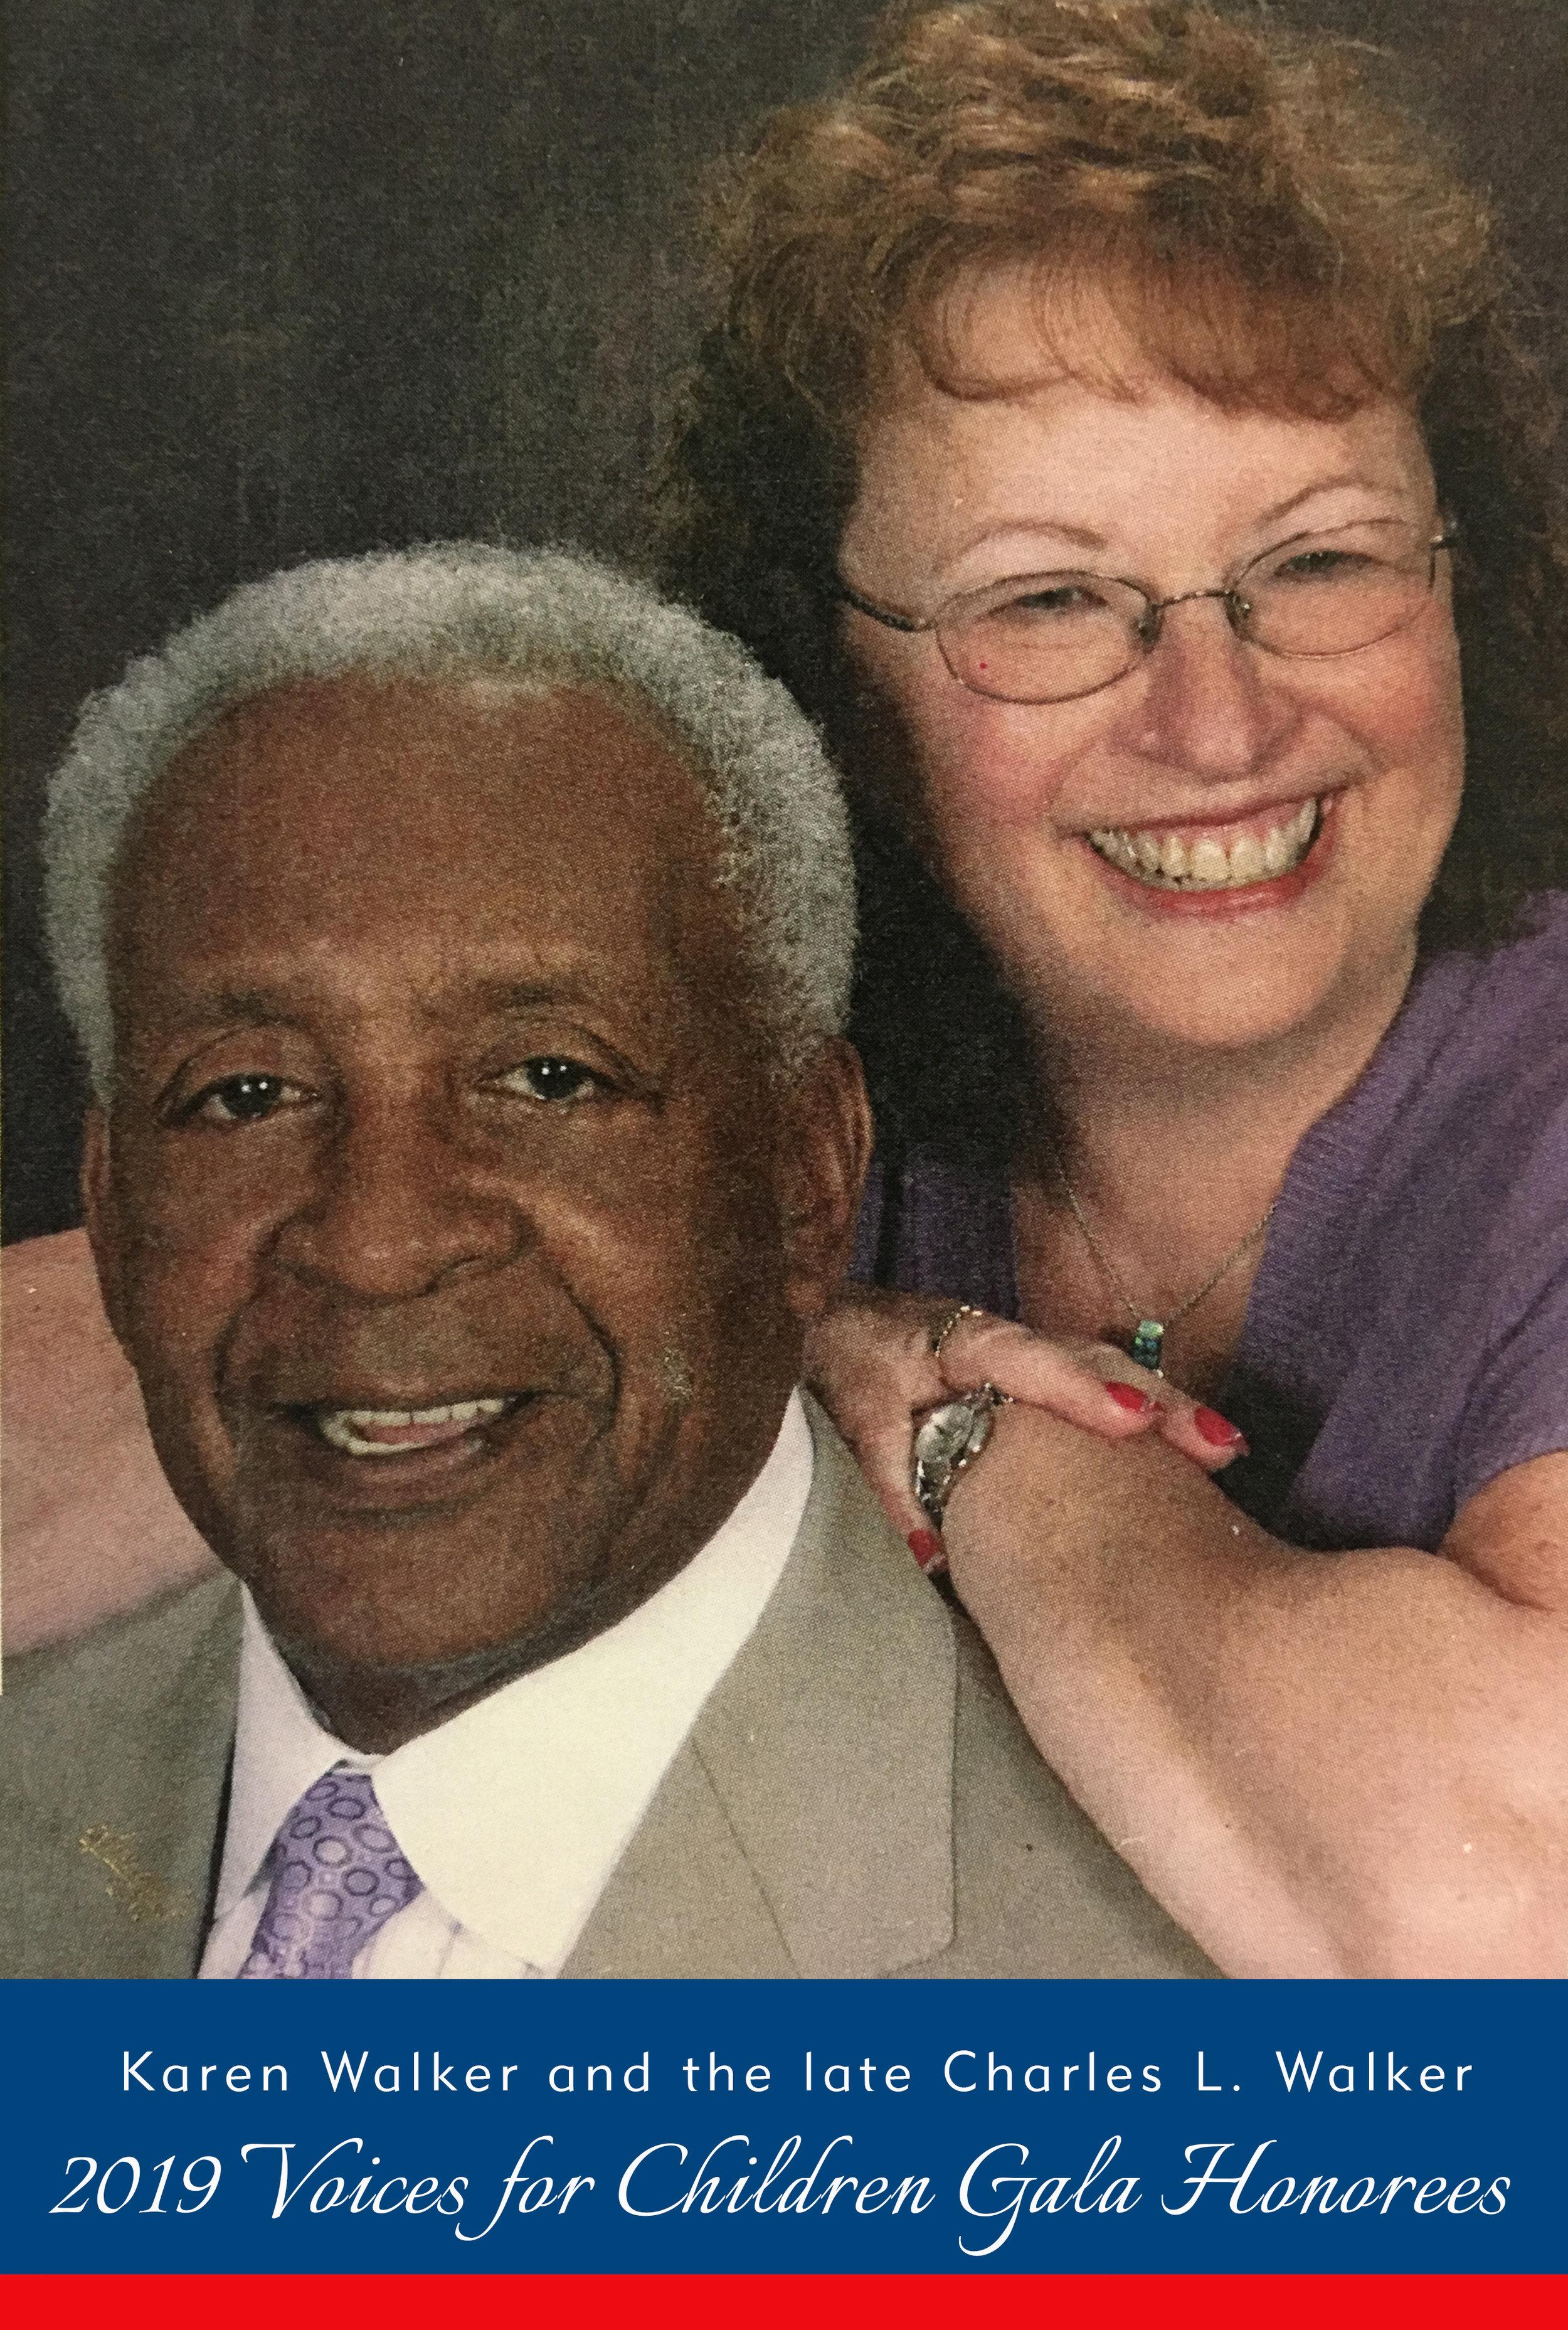 Karen and Charles Walker with Honoree Band.jpg